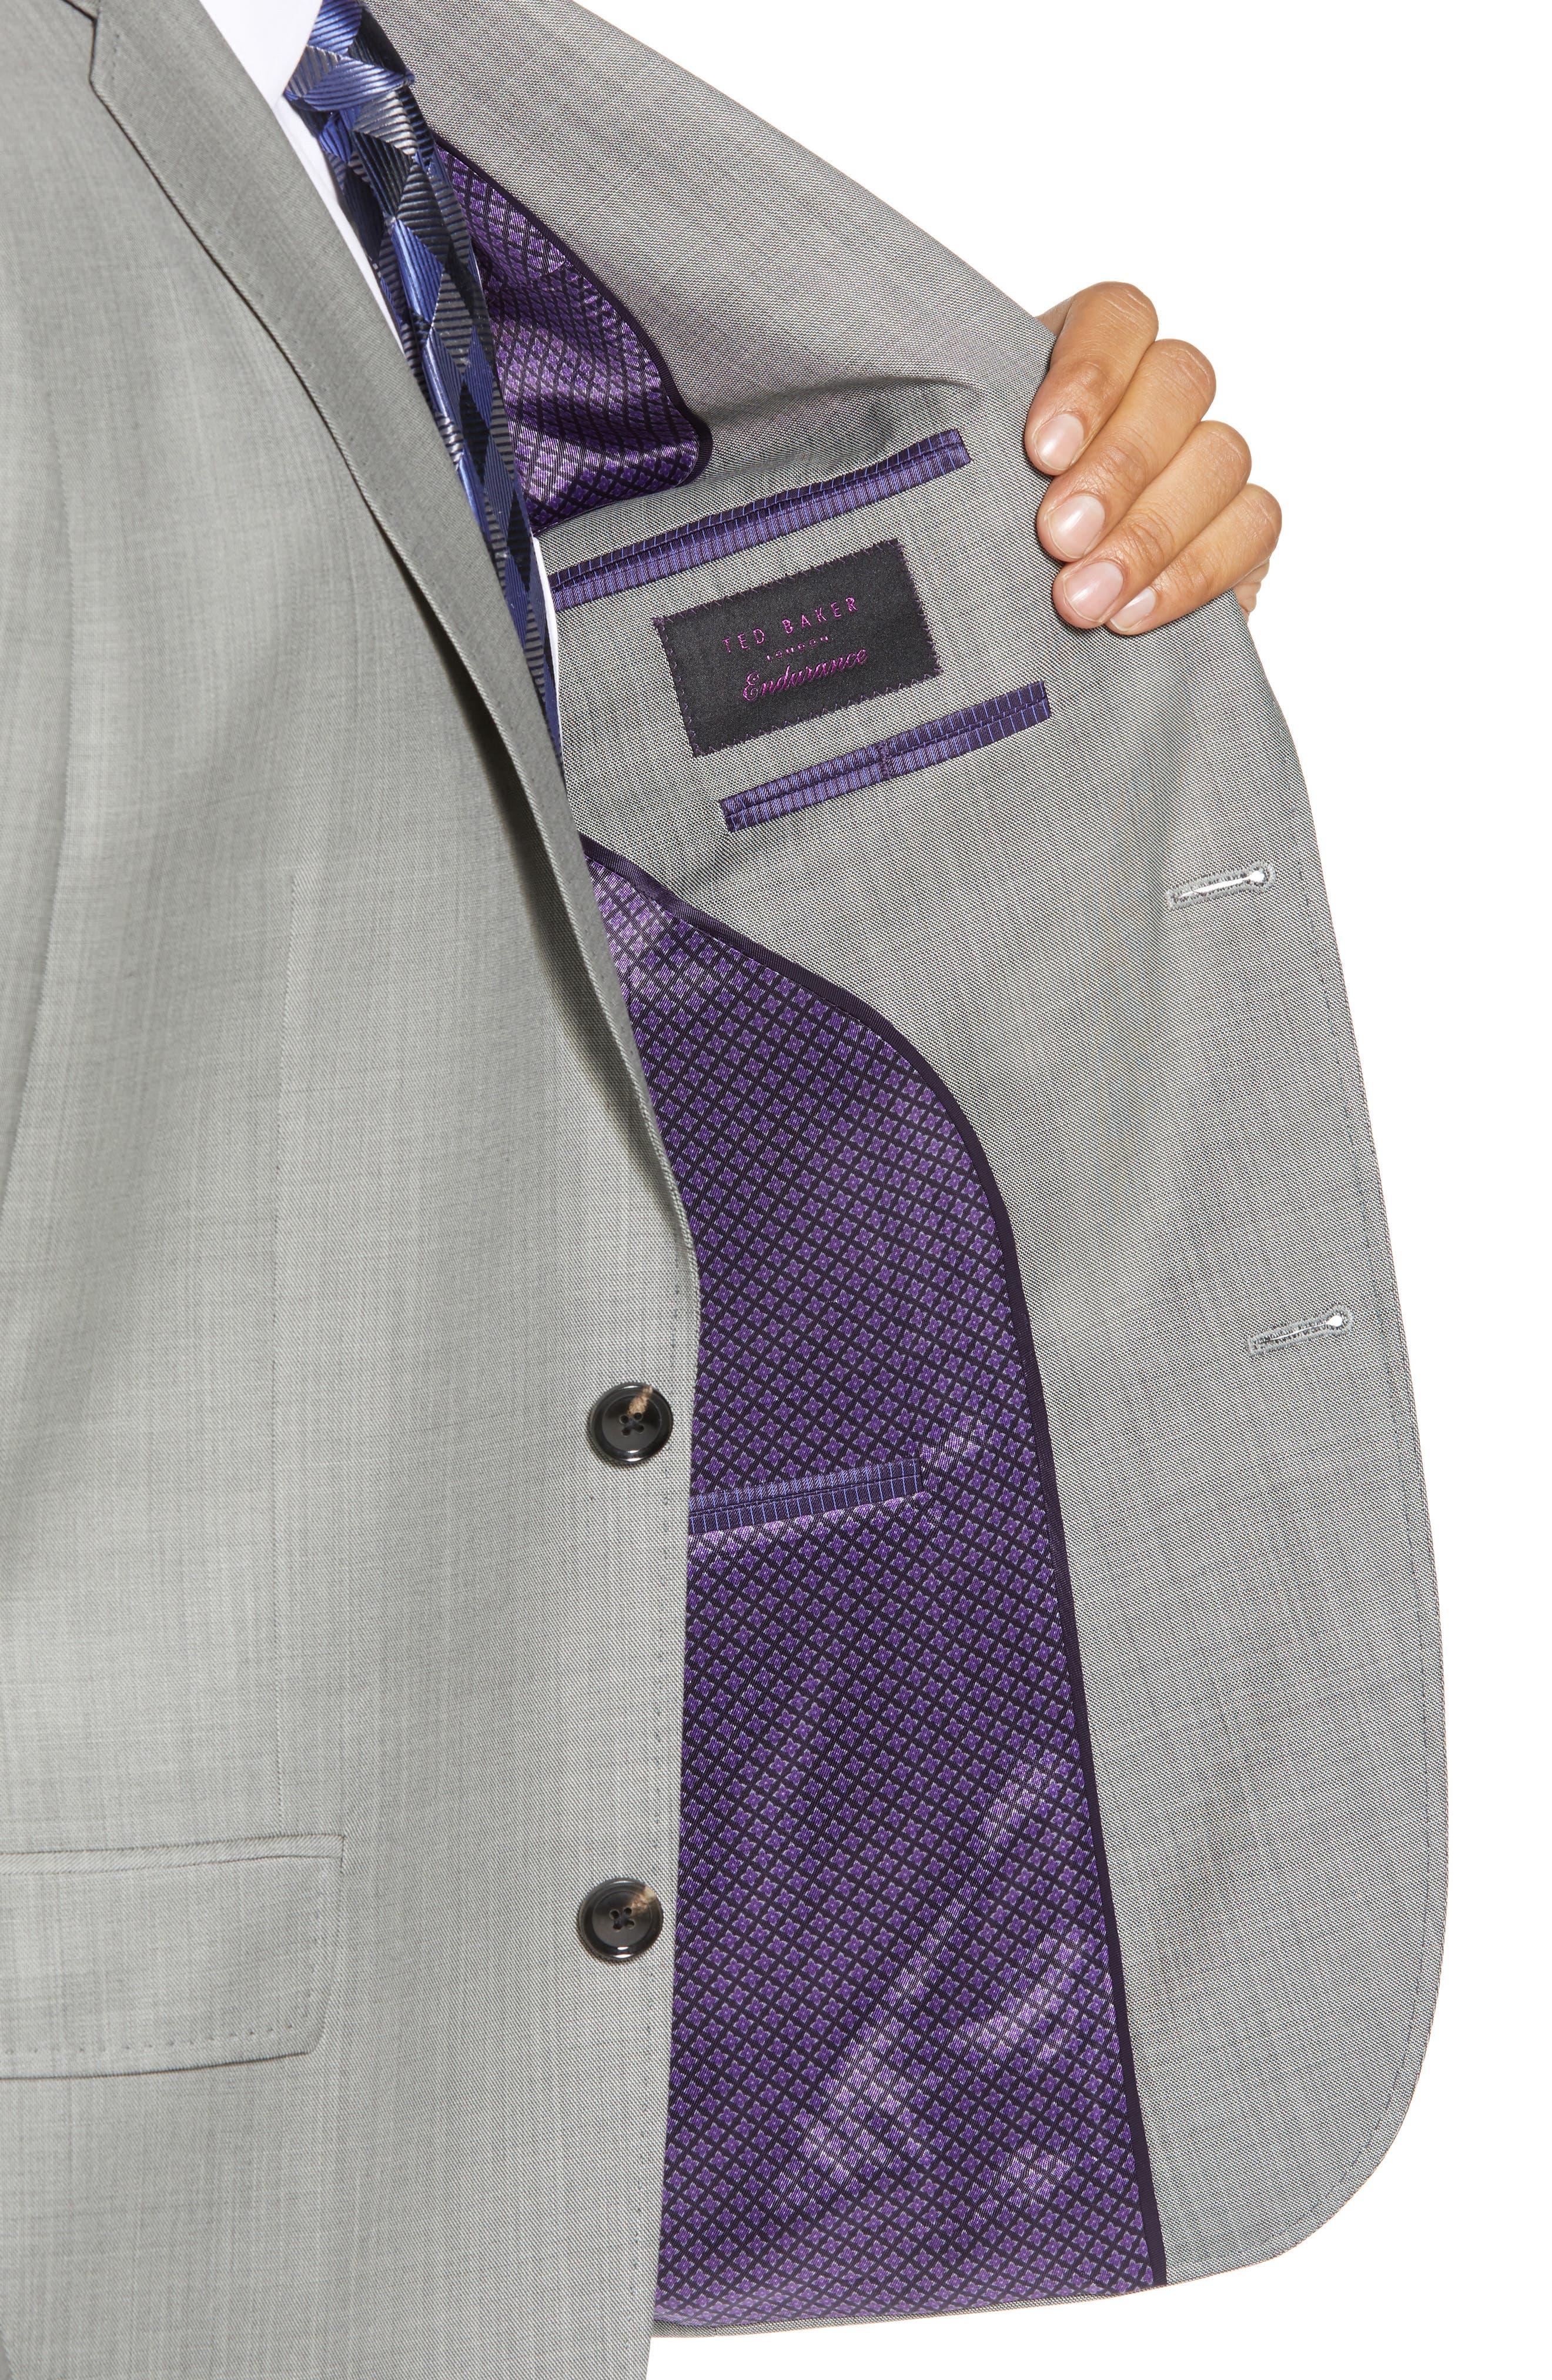 Jay Trim Fit Solid Wool Suit,                             Alternate thumbnail 4, color,                             LIGHT GREY